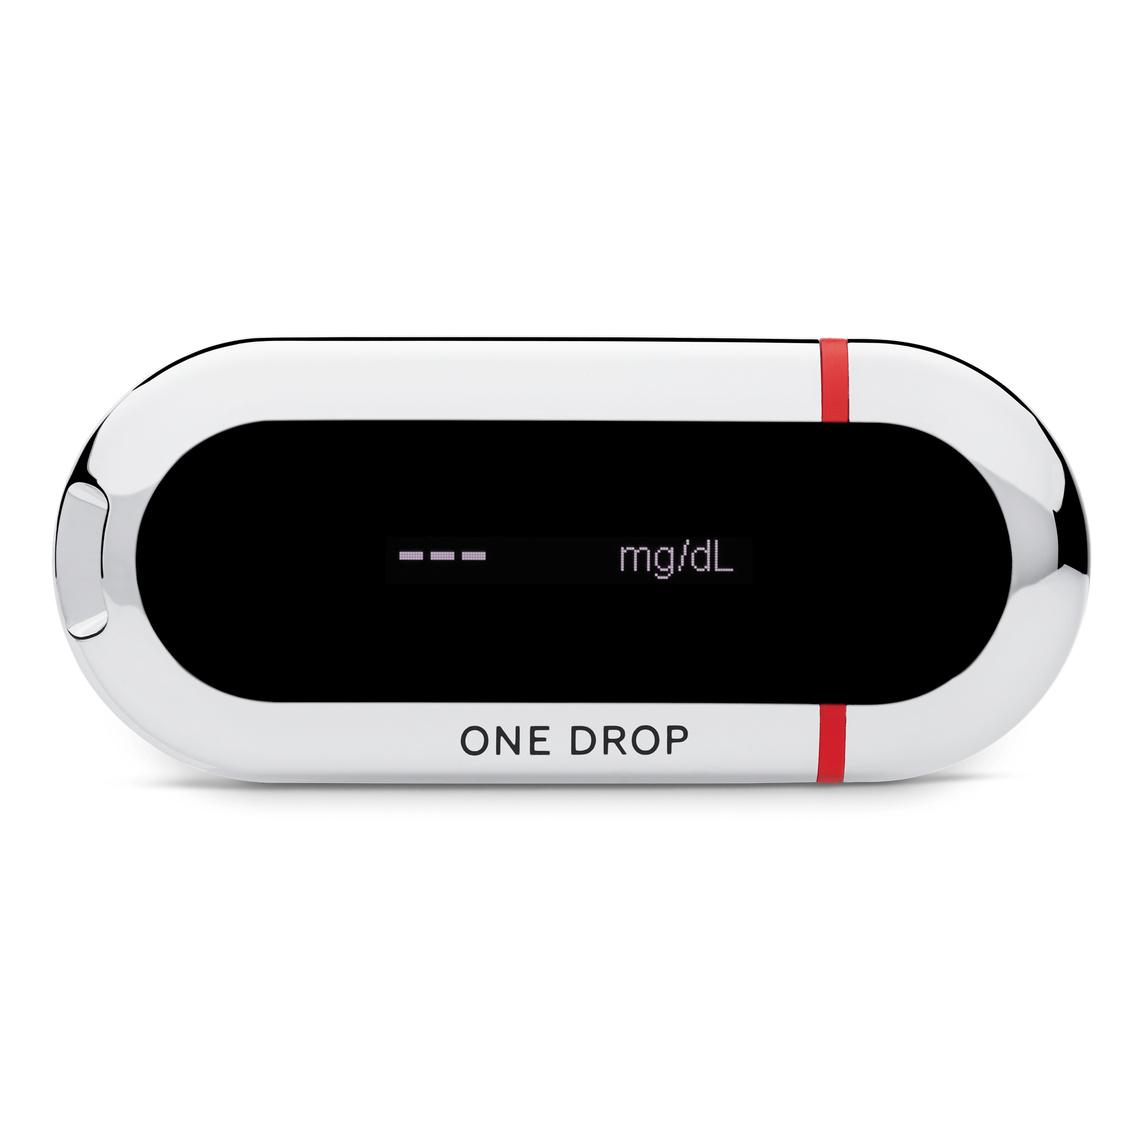 One Drop Chrome Blood Glucose Monitoring Kit